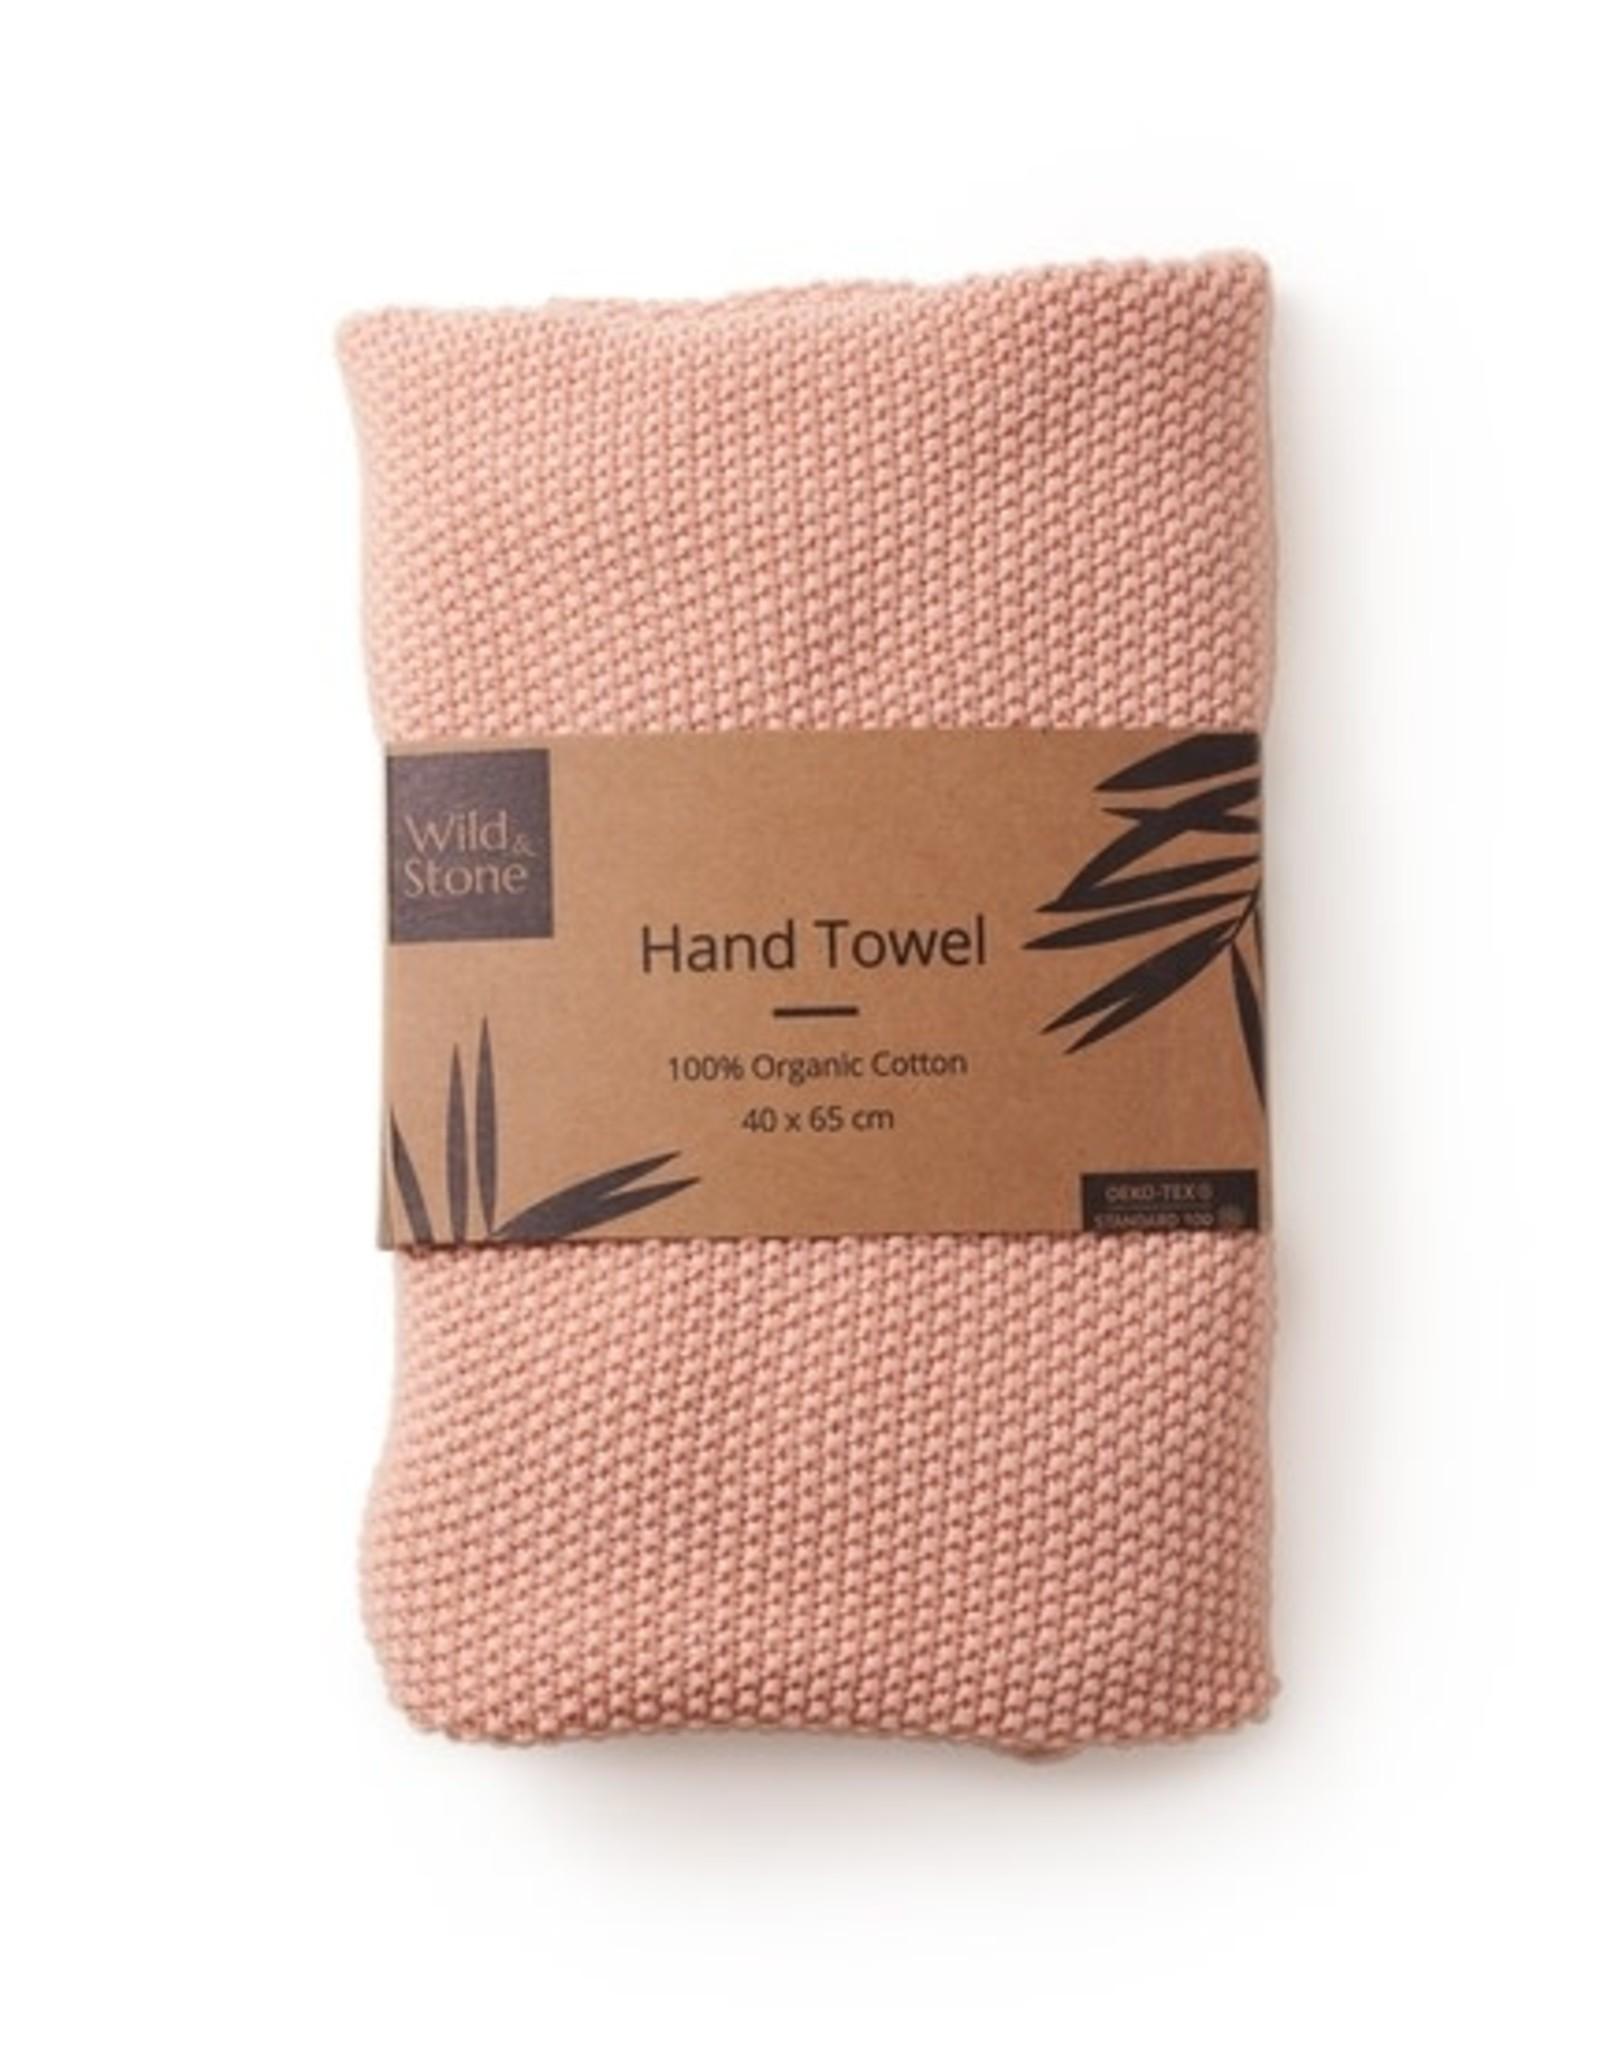 Wild & Stone Organic Cotton Hand Towel Dusty Rose